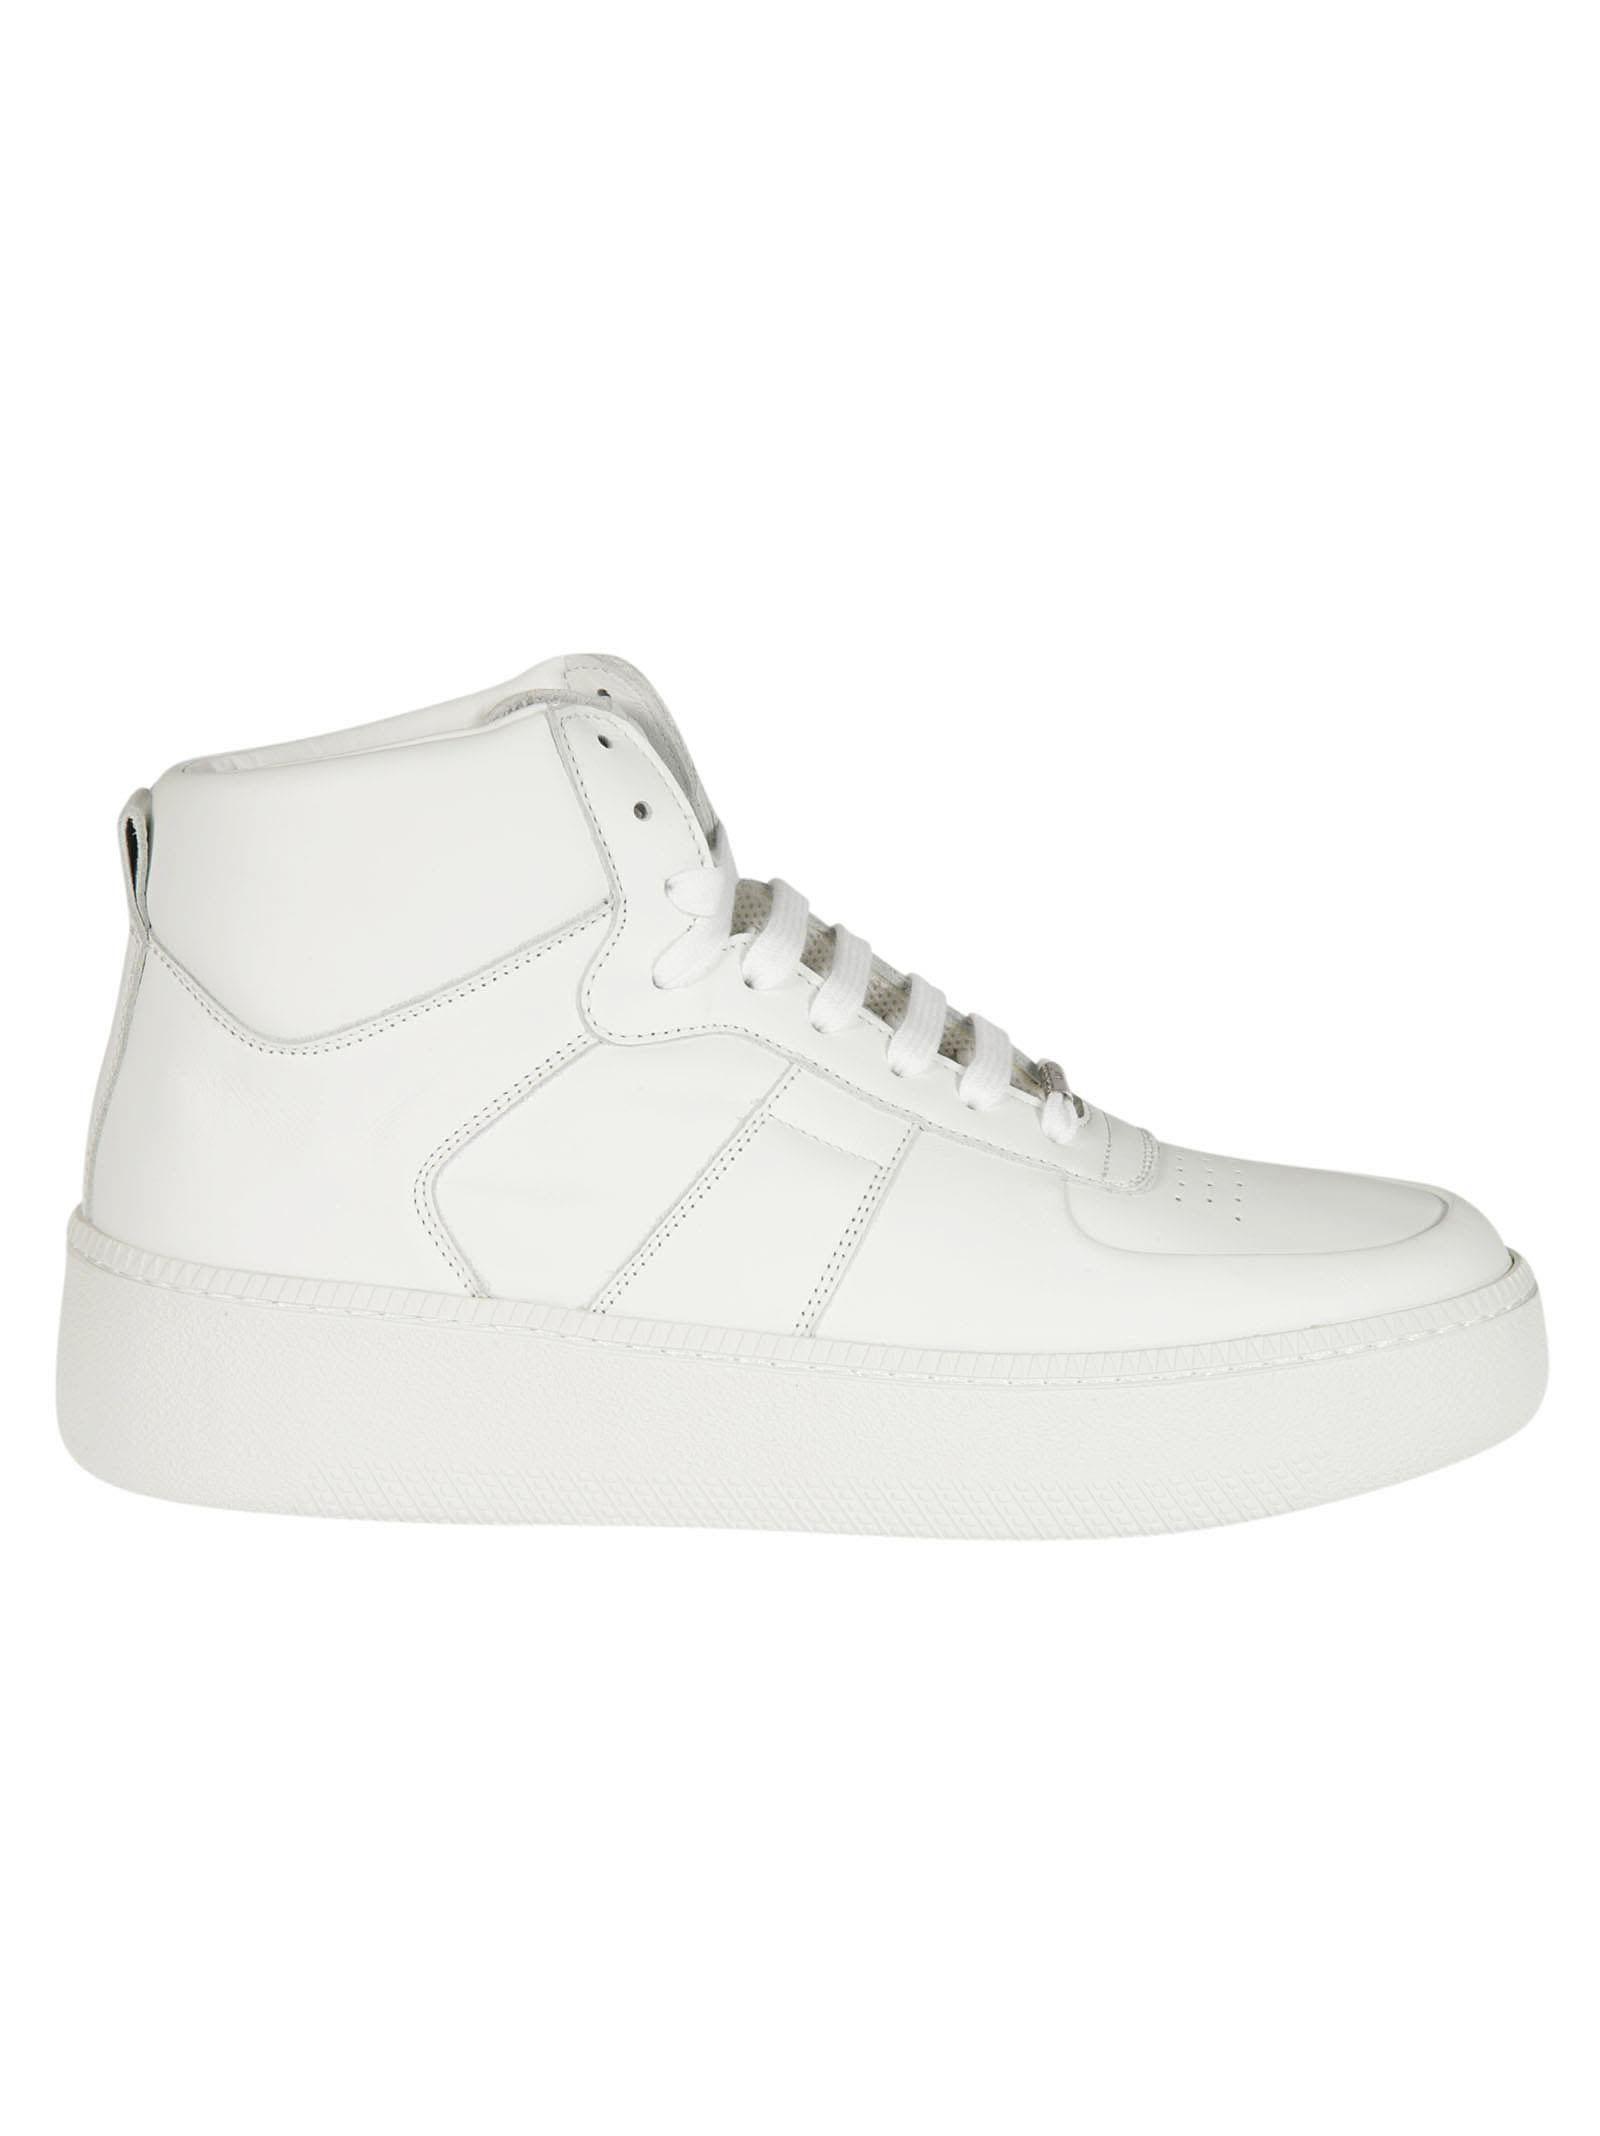 classic low-top sneakers - Black Maison Martin Margiela tcjDtV